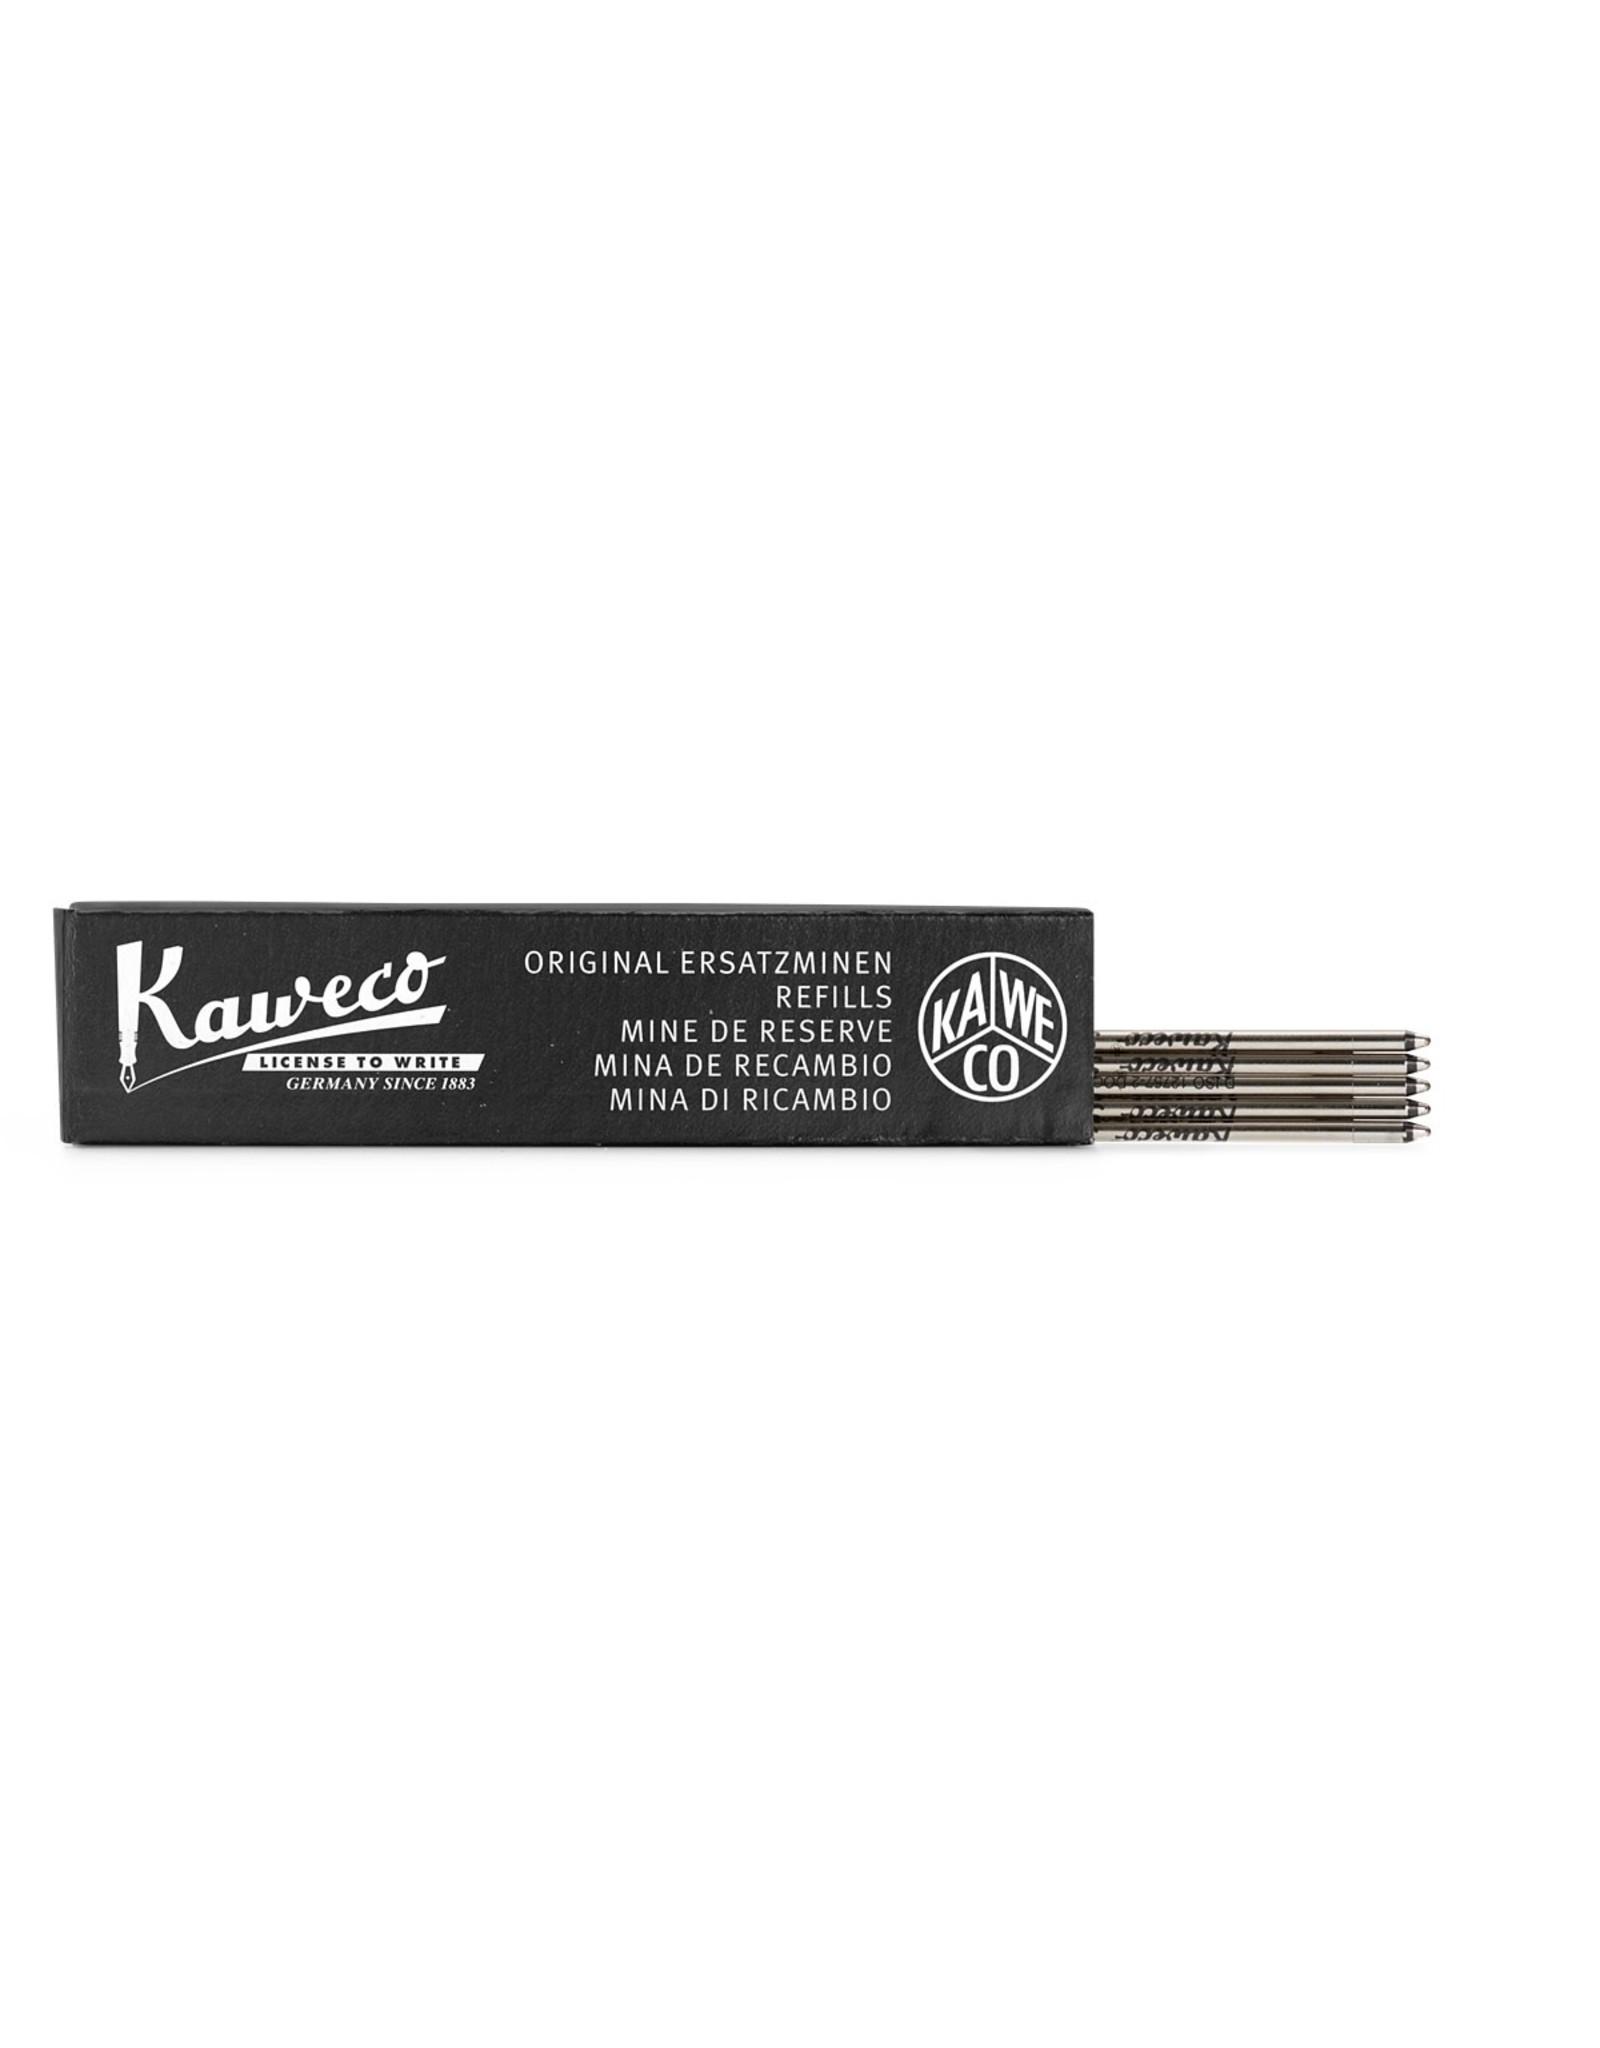 Kaweco Kaweco | D1 Balpen refill | 1.0mm | Black | 5st